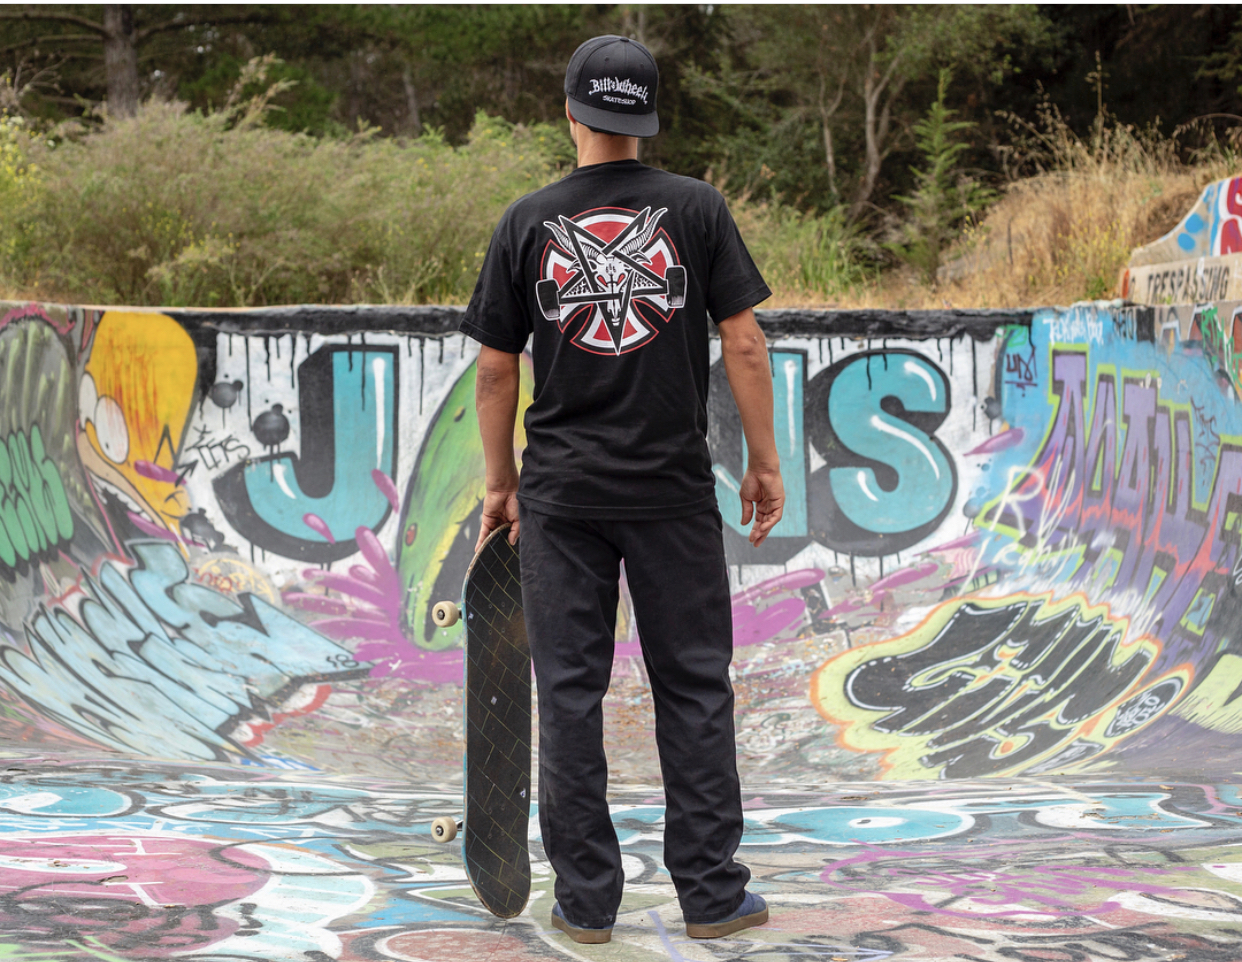 Professional Skateboarder Emmanuel Guzman